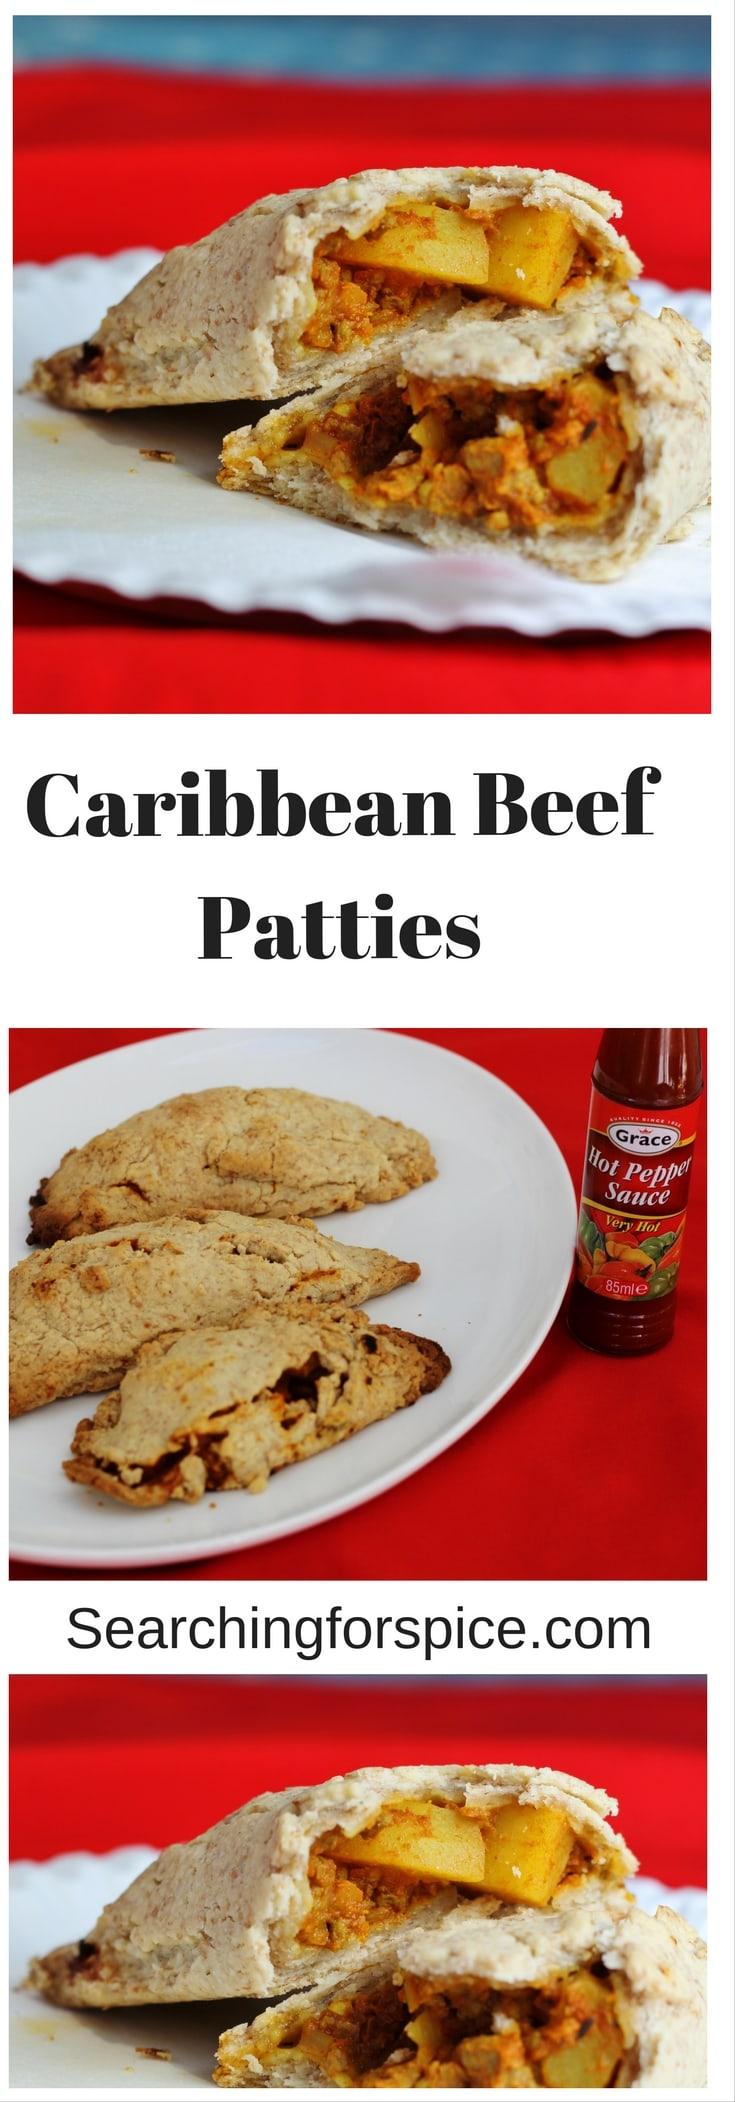 Caribbean Beef Patties